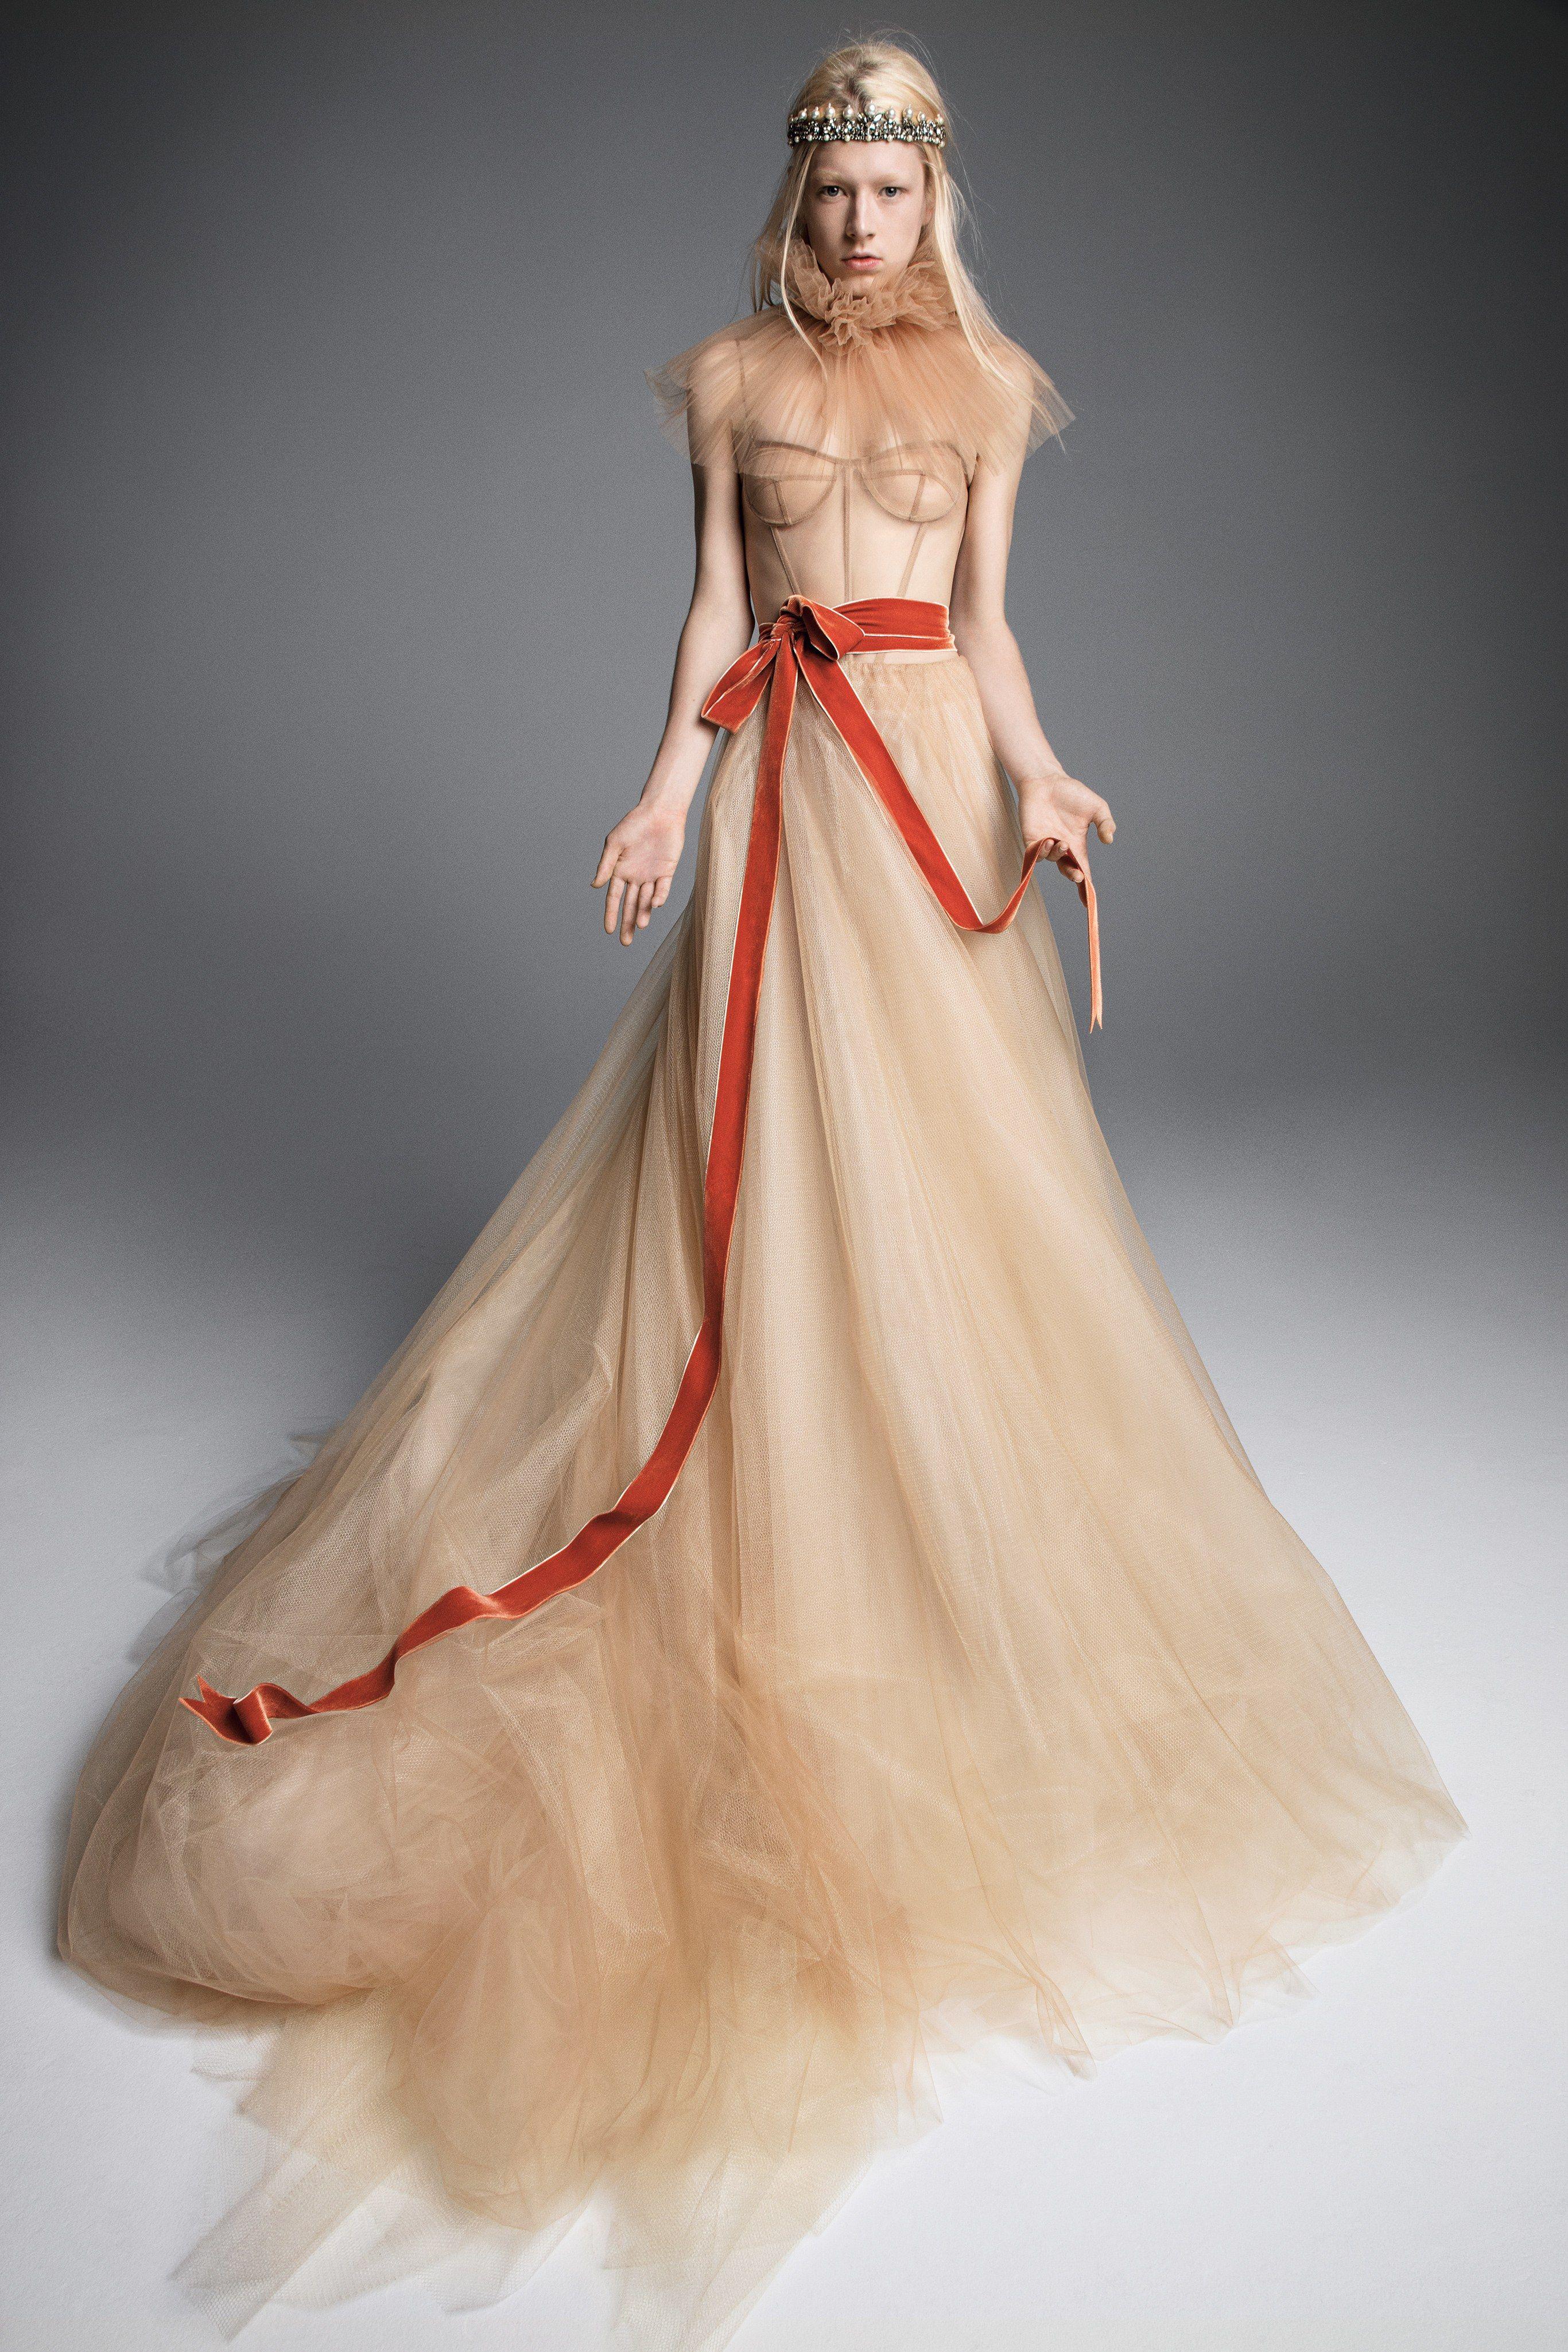 b57ffdd20cf26 Vera Wang Bridal Fall 2019 Fashion Show in 2019 | Weddings | Vera ...